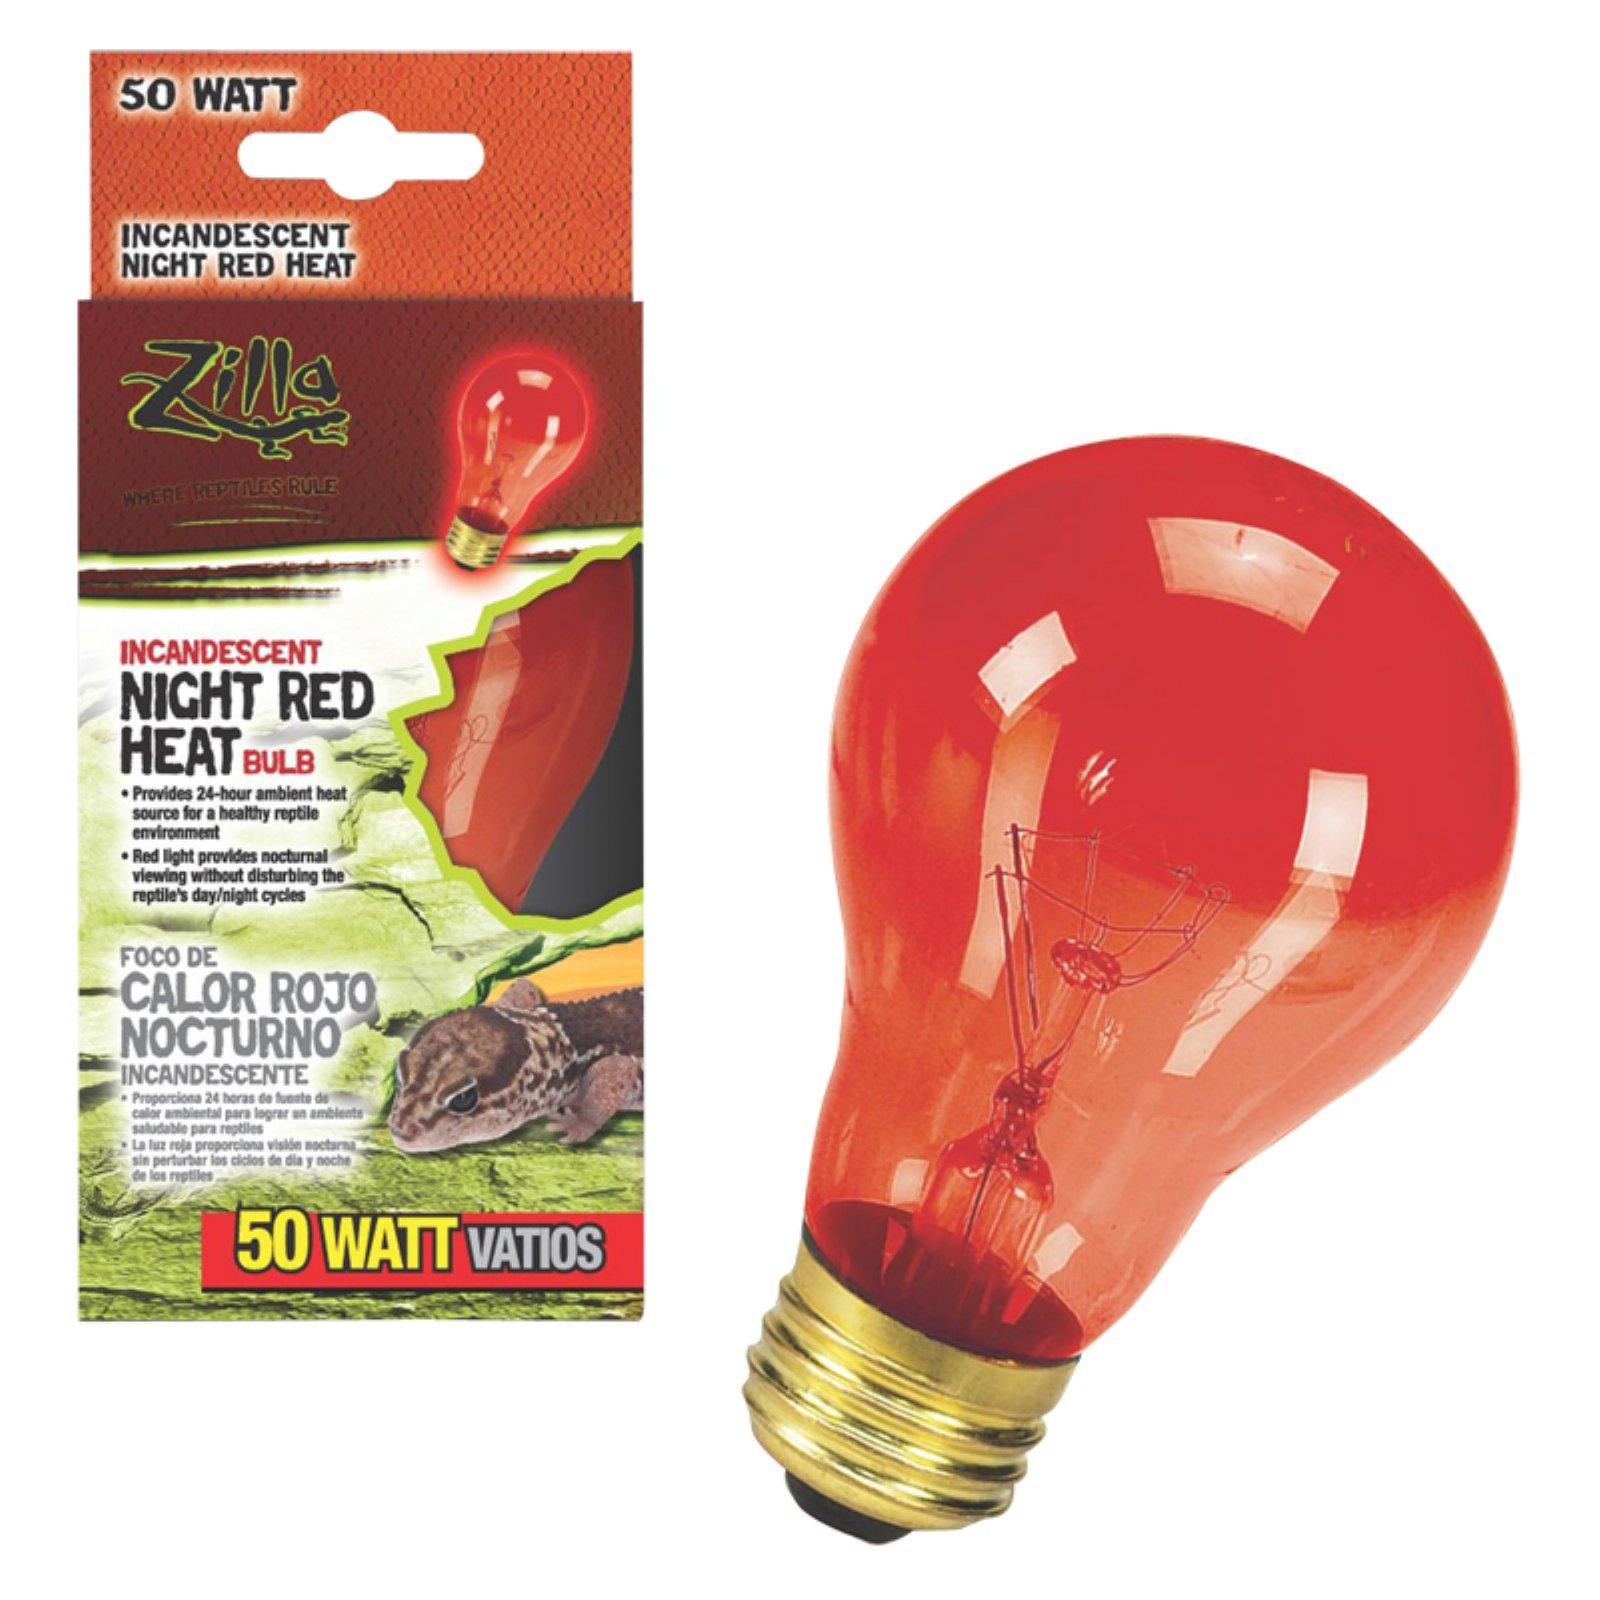 Zilla Night Red Heat Incandescent Bulb